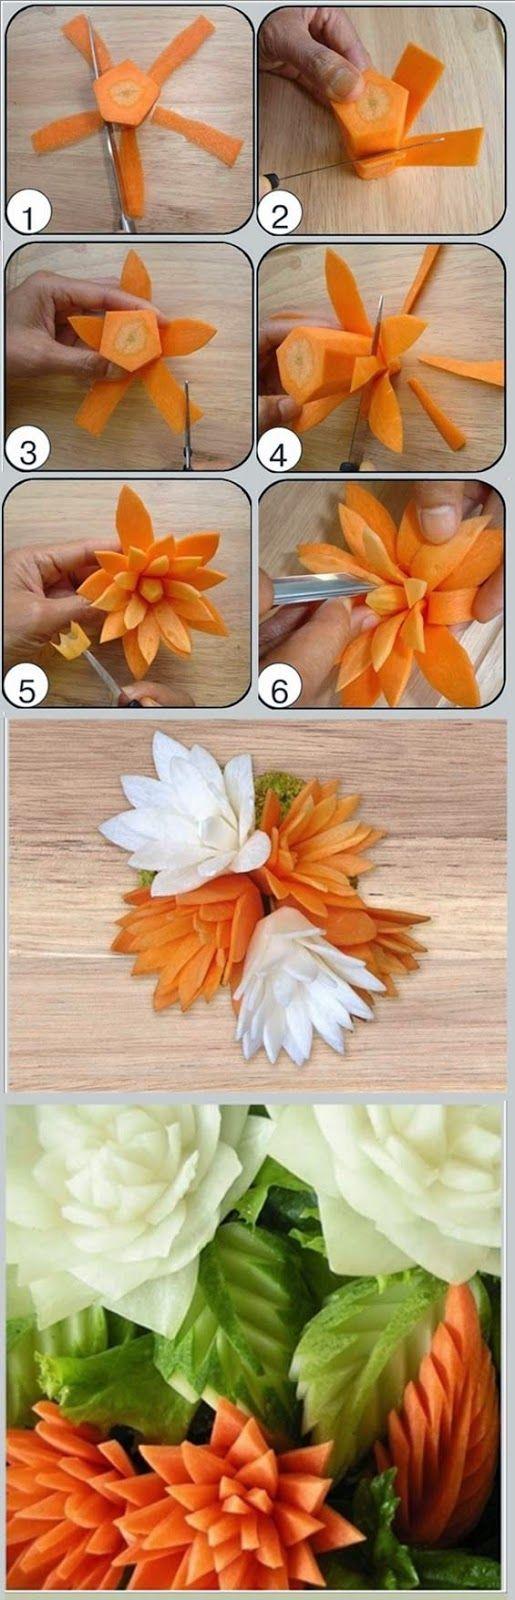 Creative Carrot flower idea - Foood Style